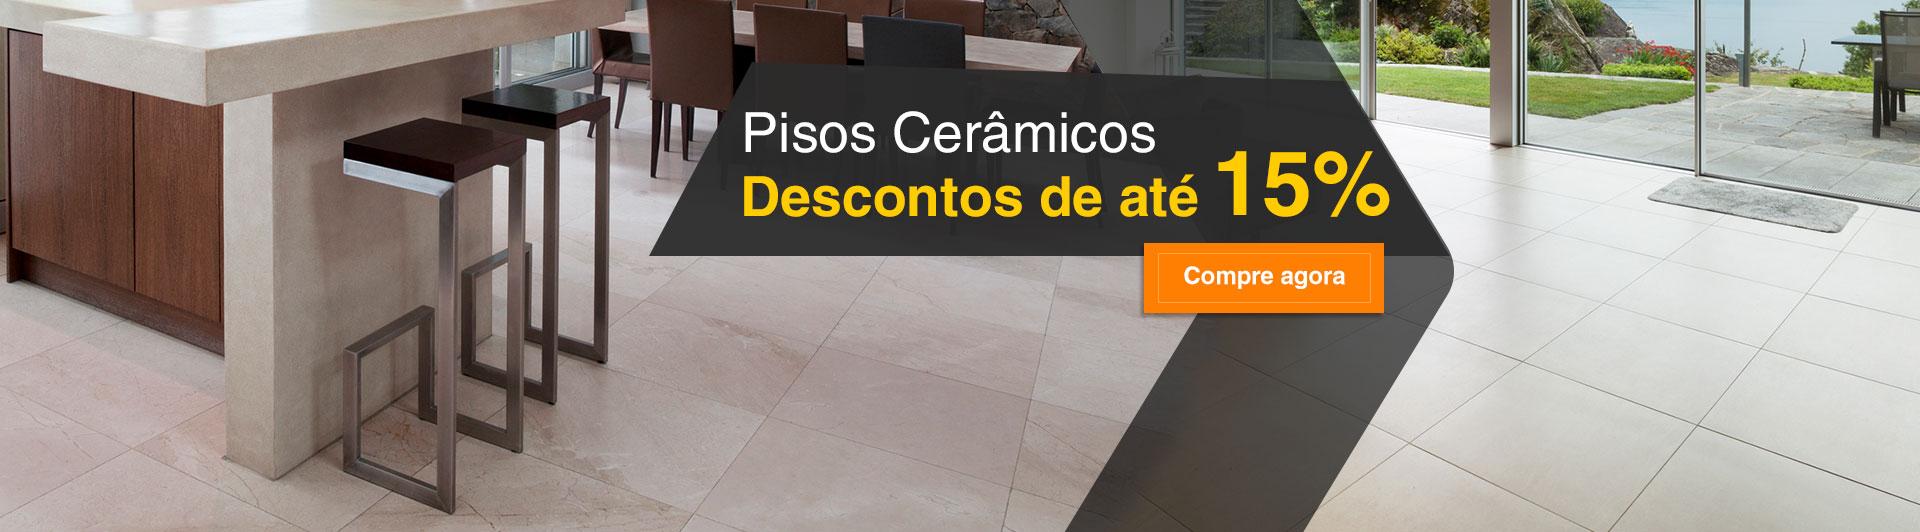 Banner - Pisos